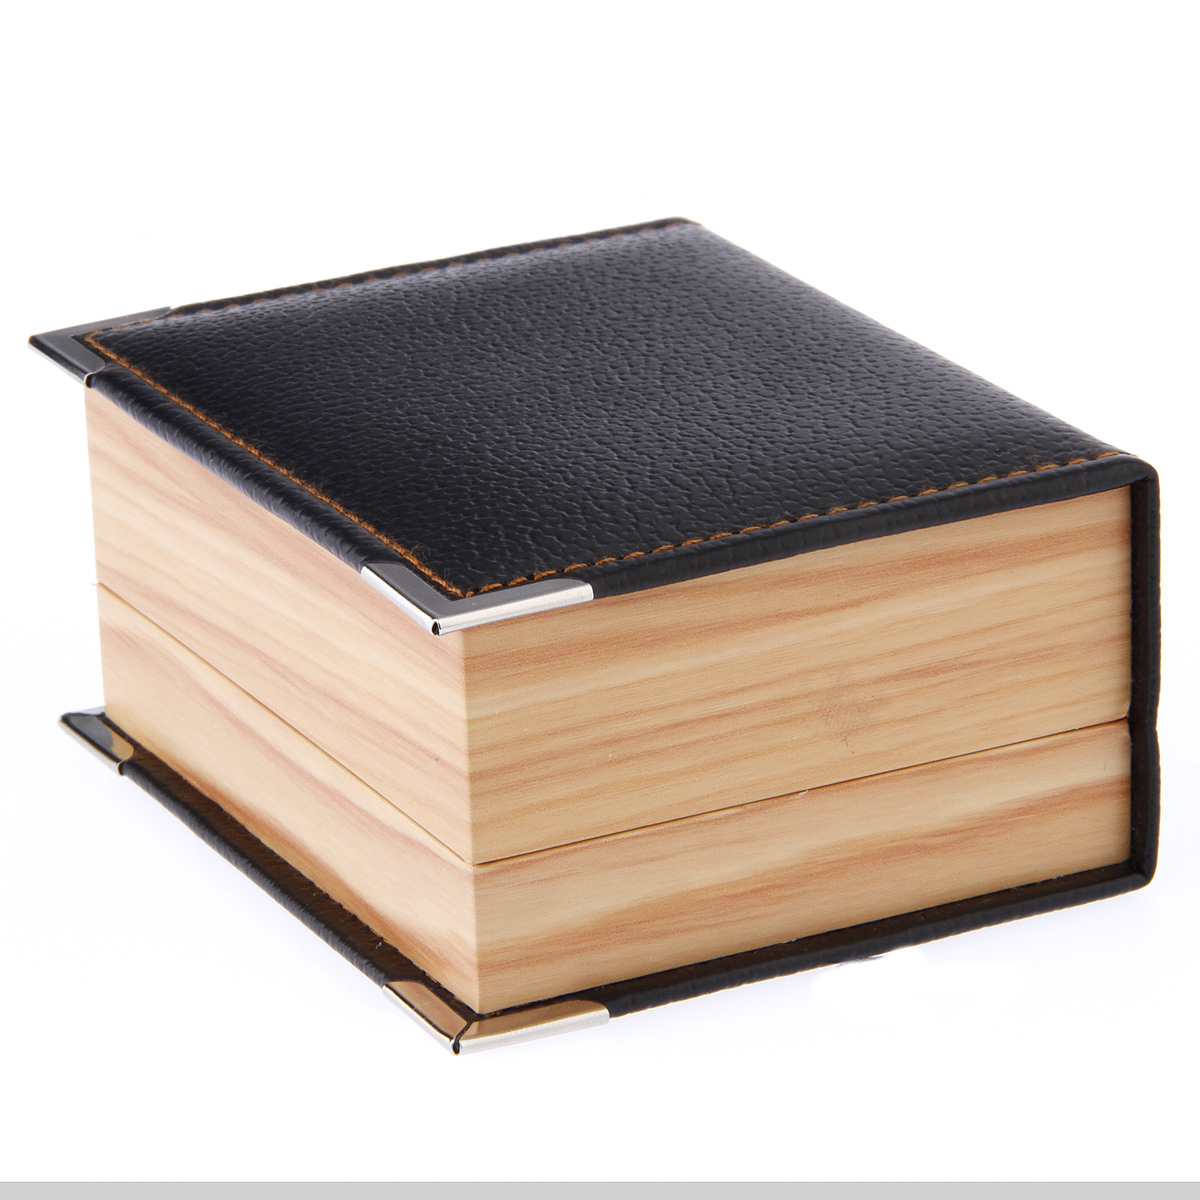 Искусственная кожа текстура ...: ru.aliexpress.com/store/product/Free-shipping-top-quality-faux...